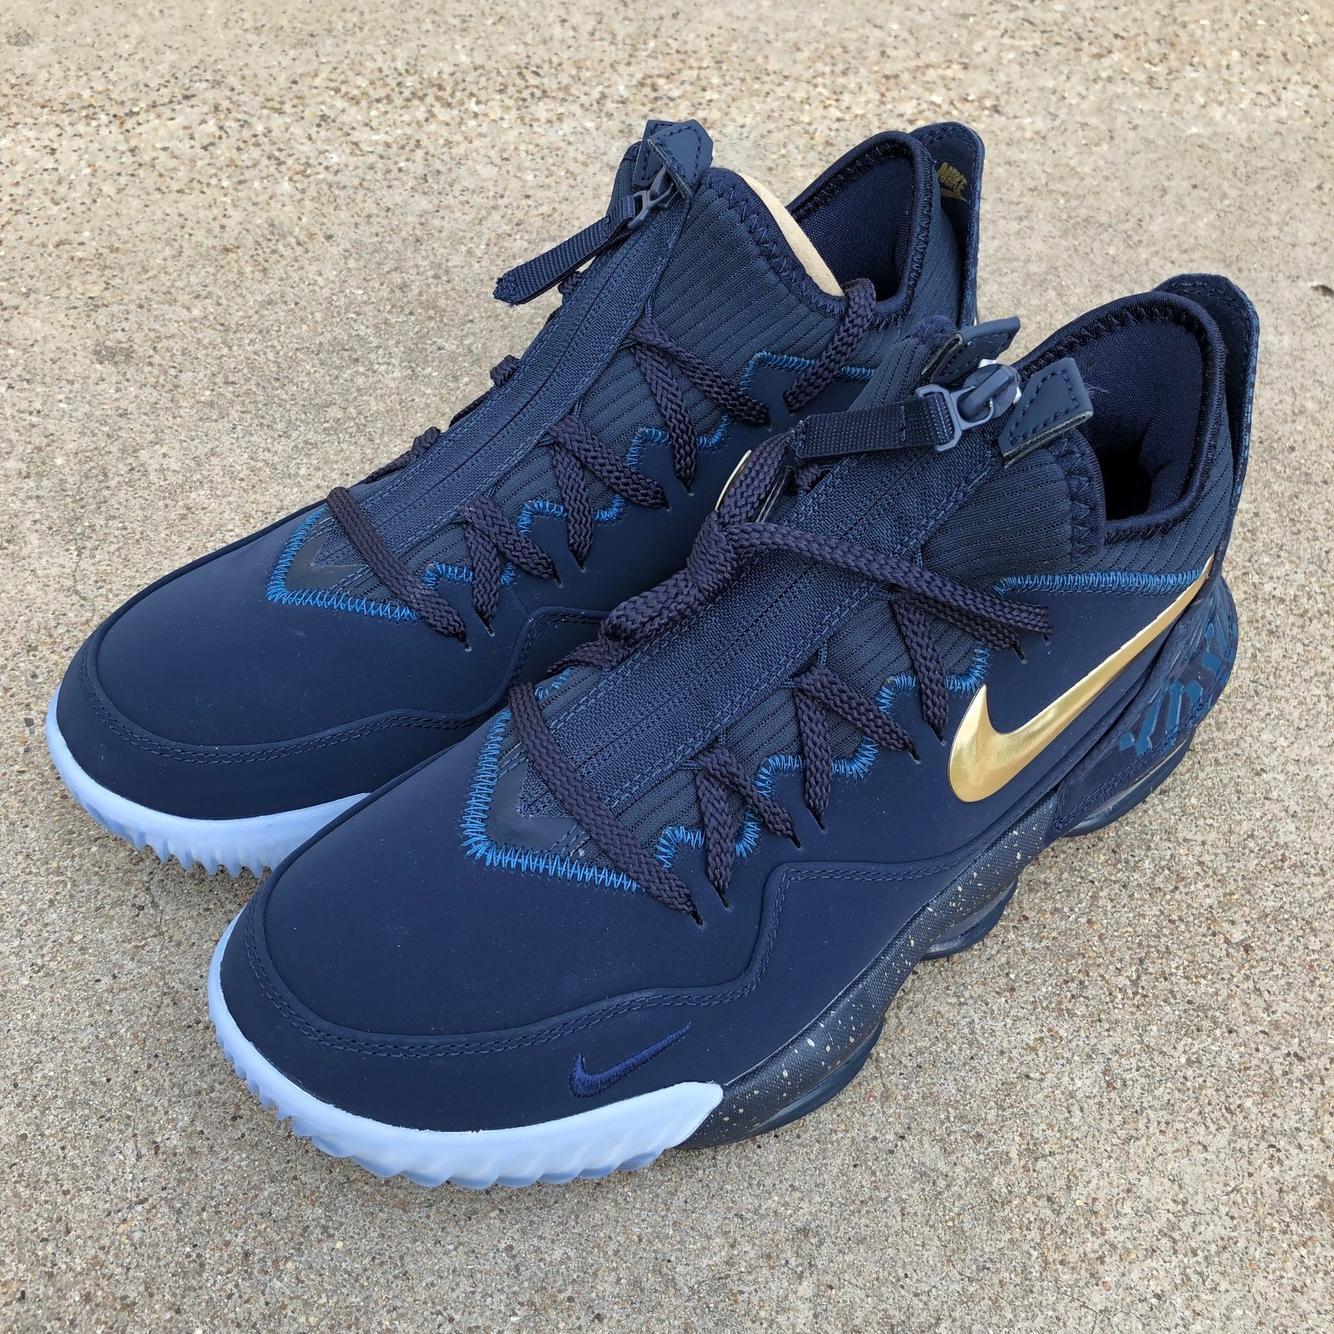 Nike Titan's LeBron 16 Low 'Agimat' sz